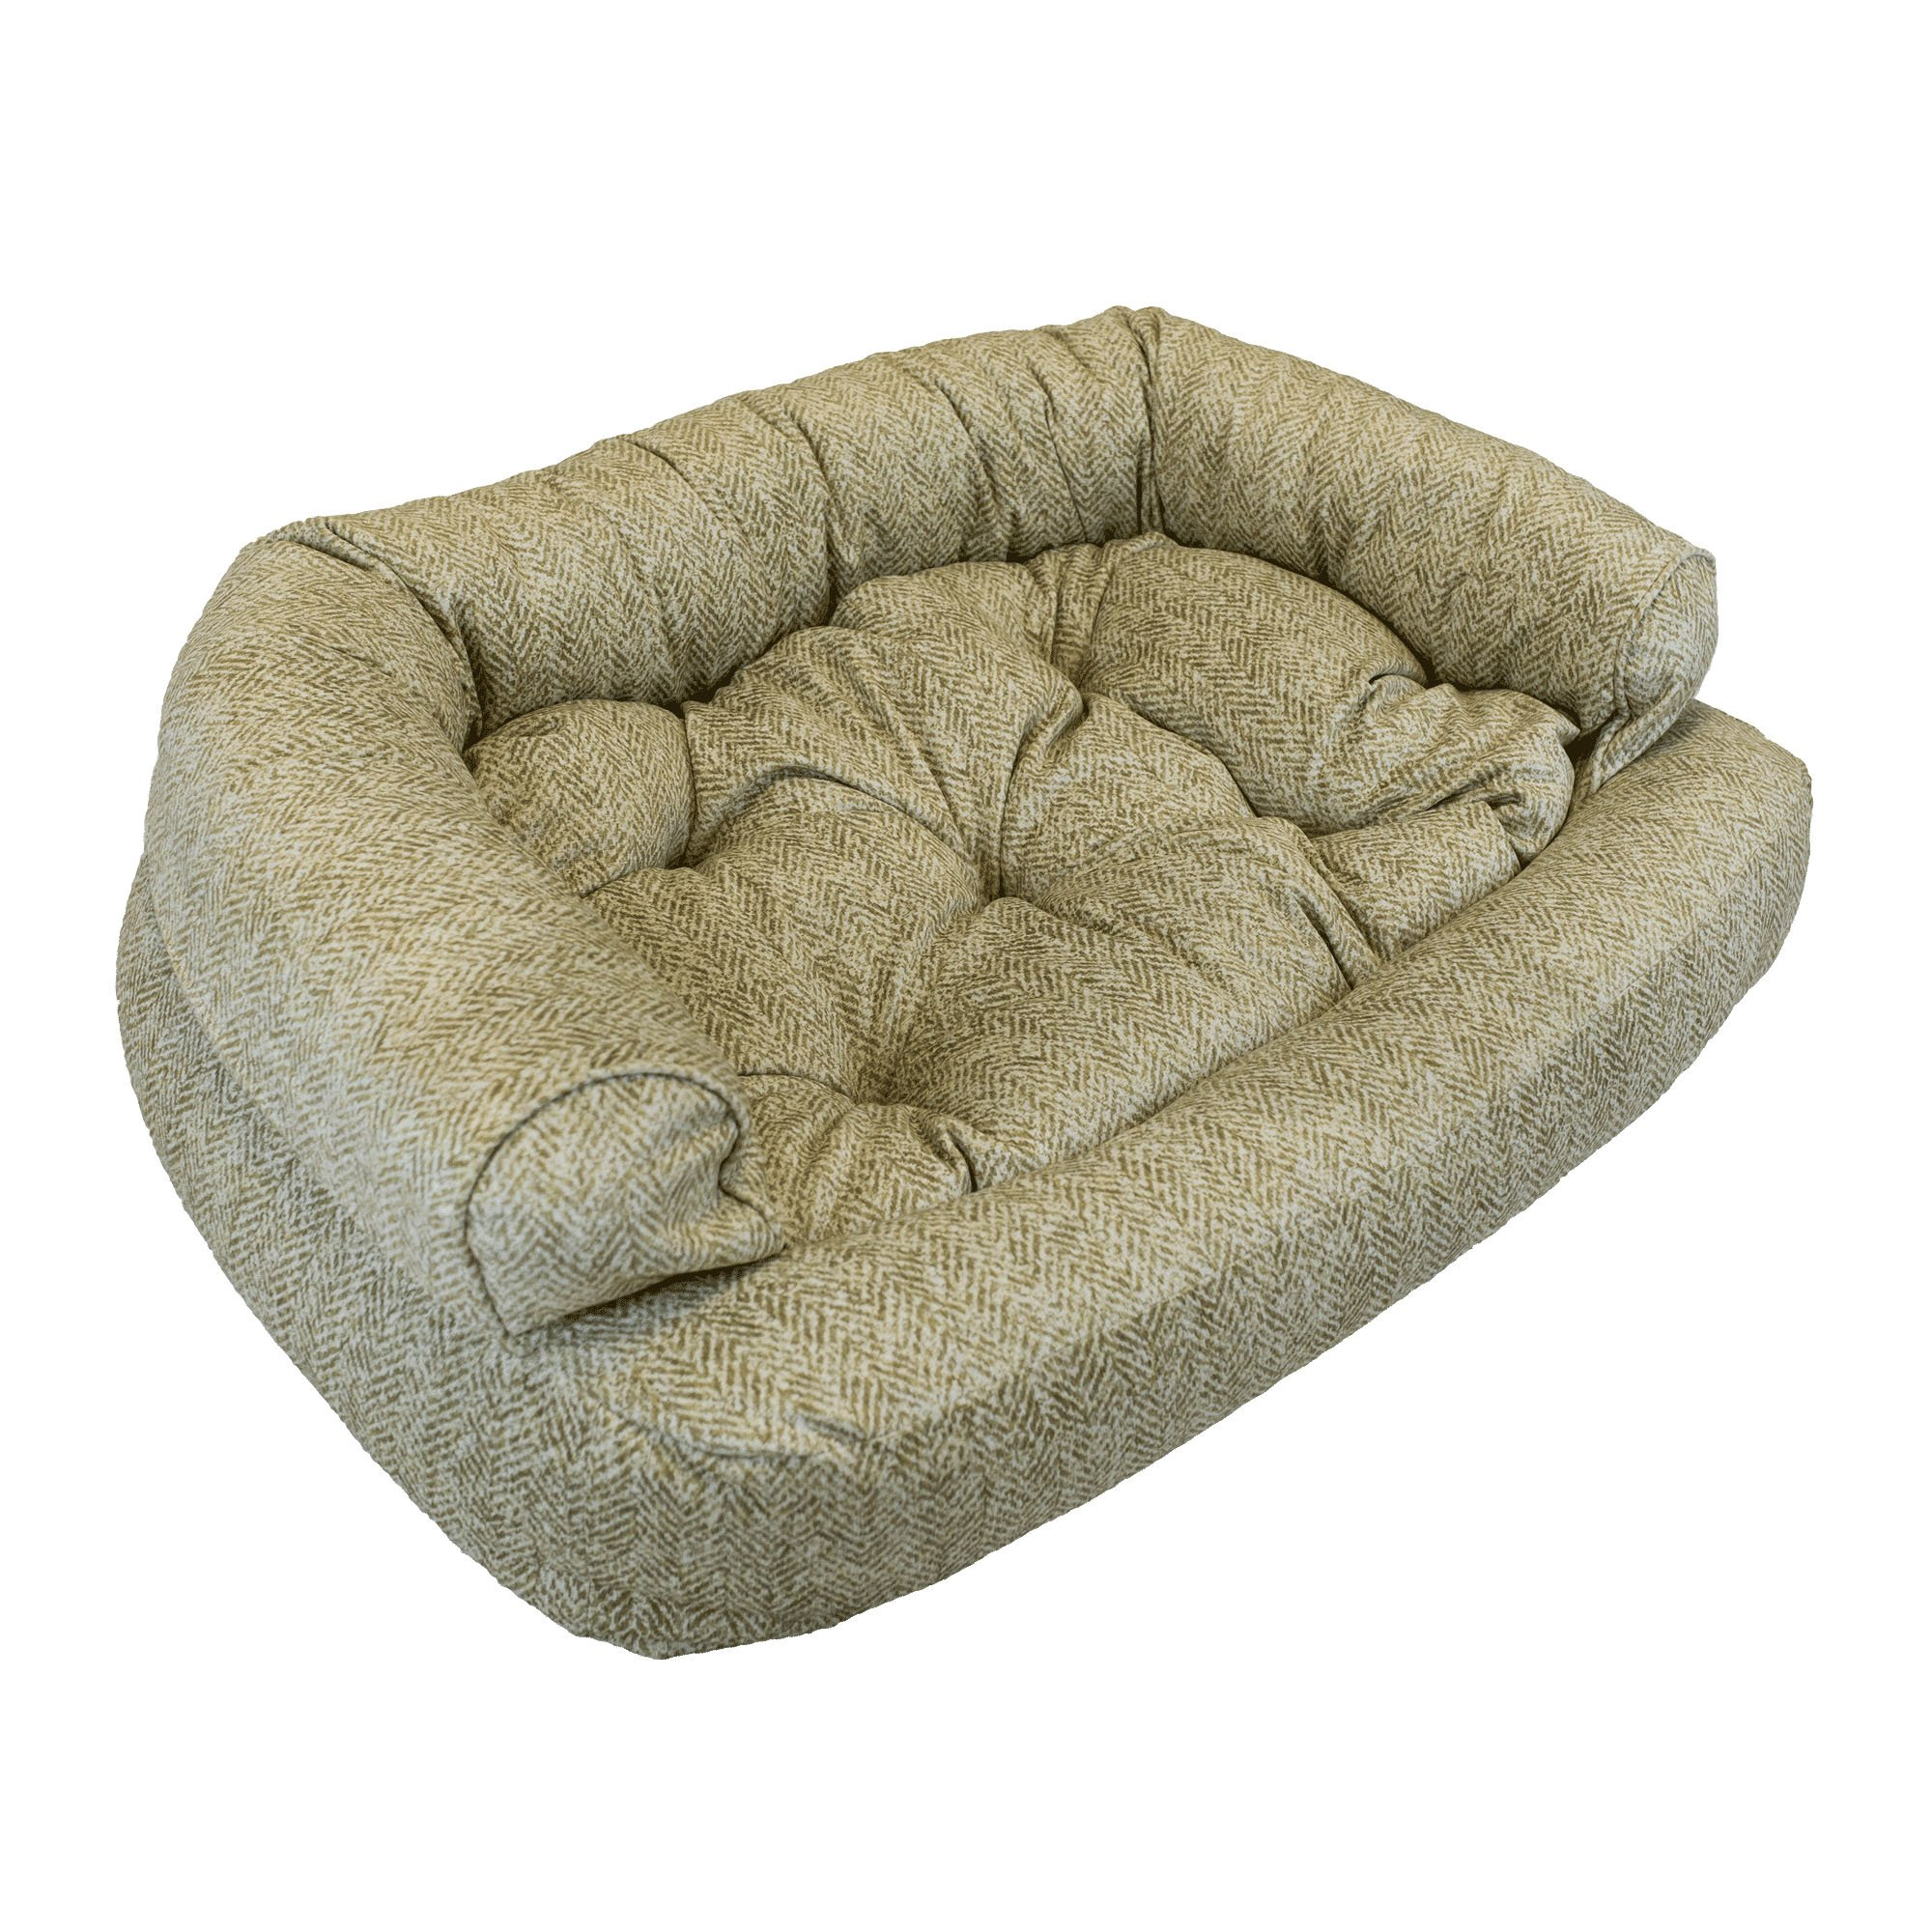 Marvelous Snoozer Luxury Overstuffed Pet Sofa In Palmer Citron Petco Download Free Architecture Designs Fluibritishbridgeorg